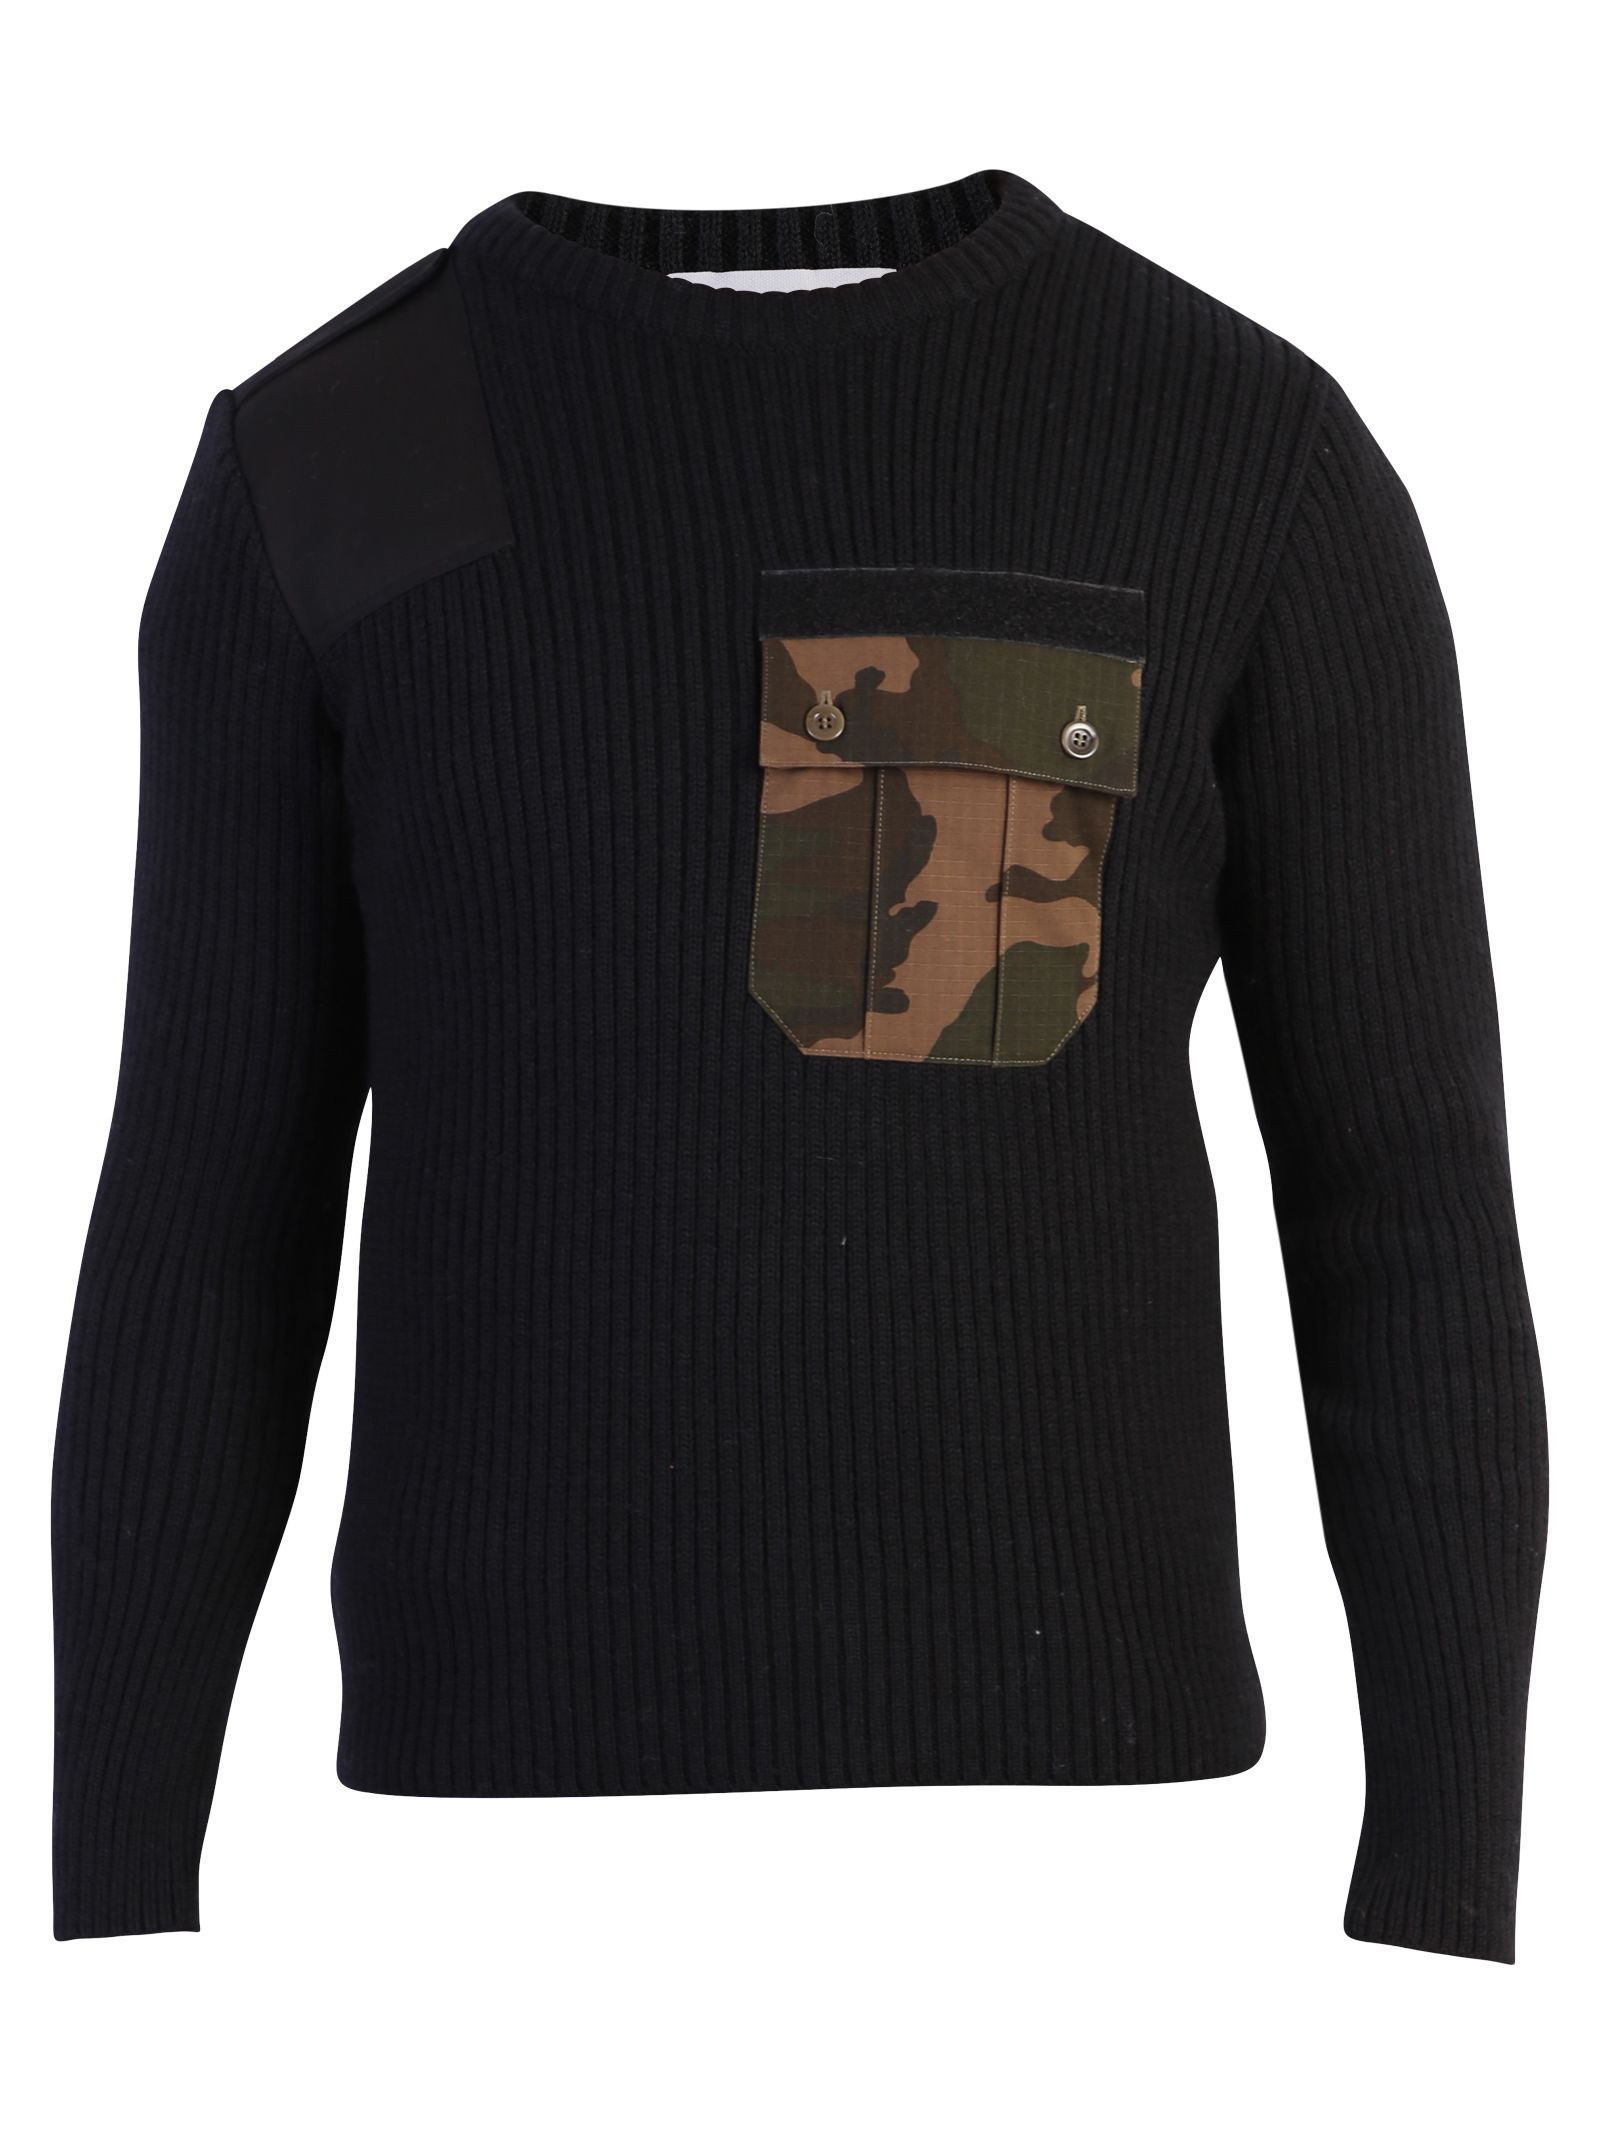 Gosha Rubchinskiy Wool Sweater